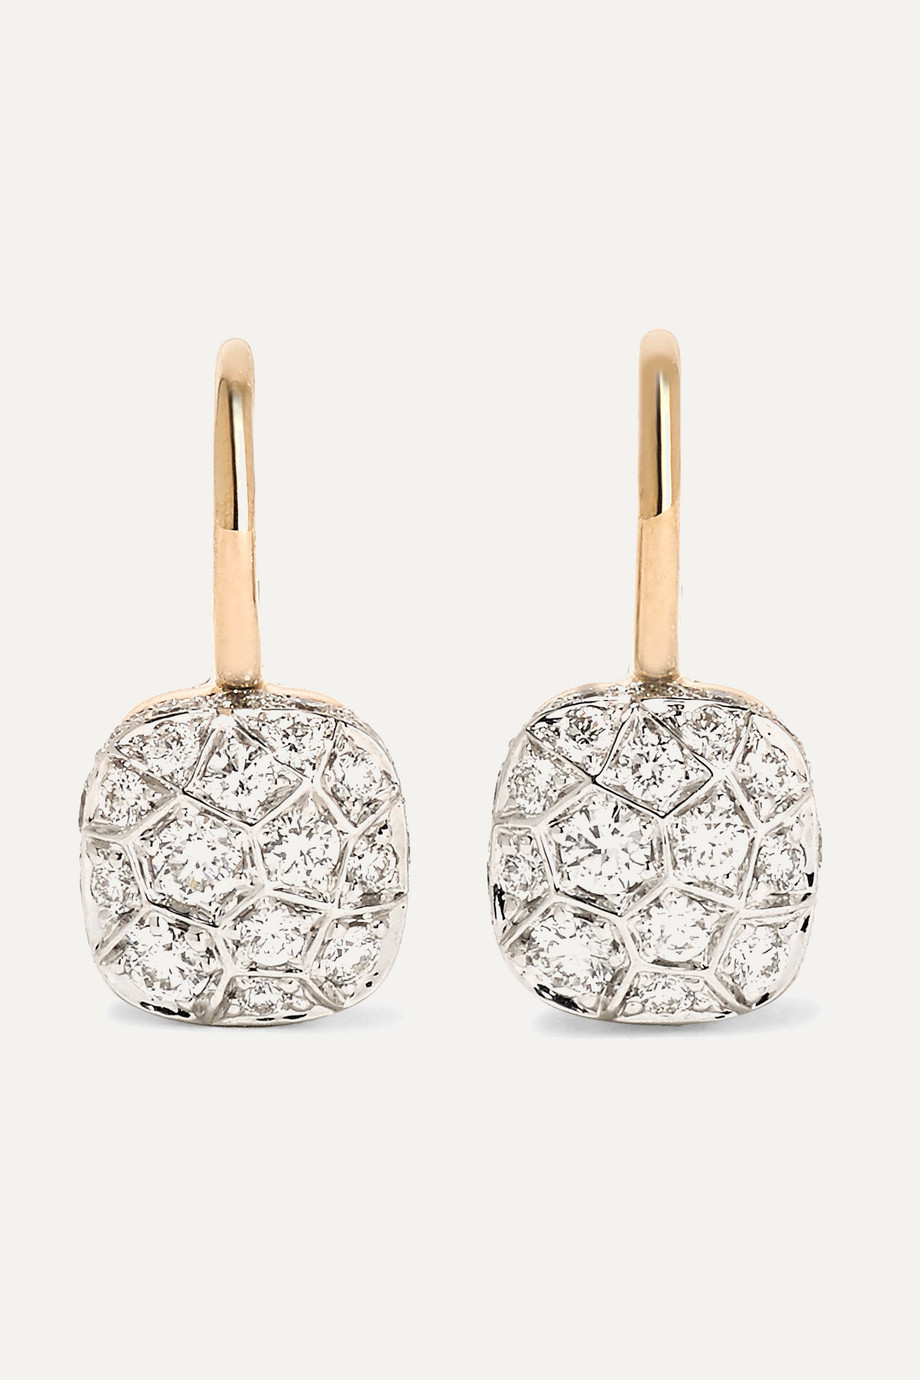 Pomellato Nudo 18-karat rose and white gold diamond earrings